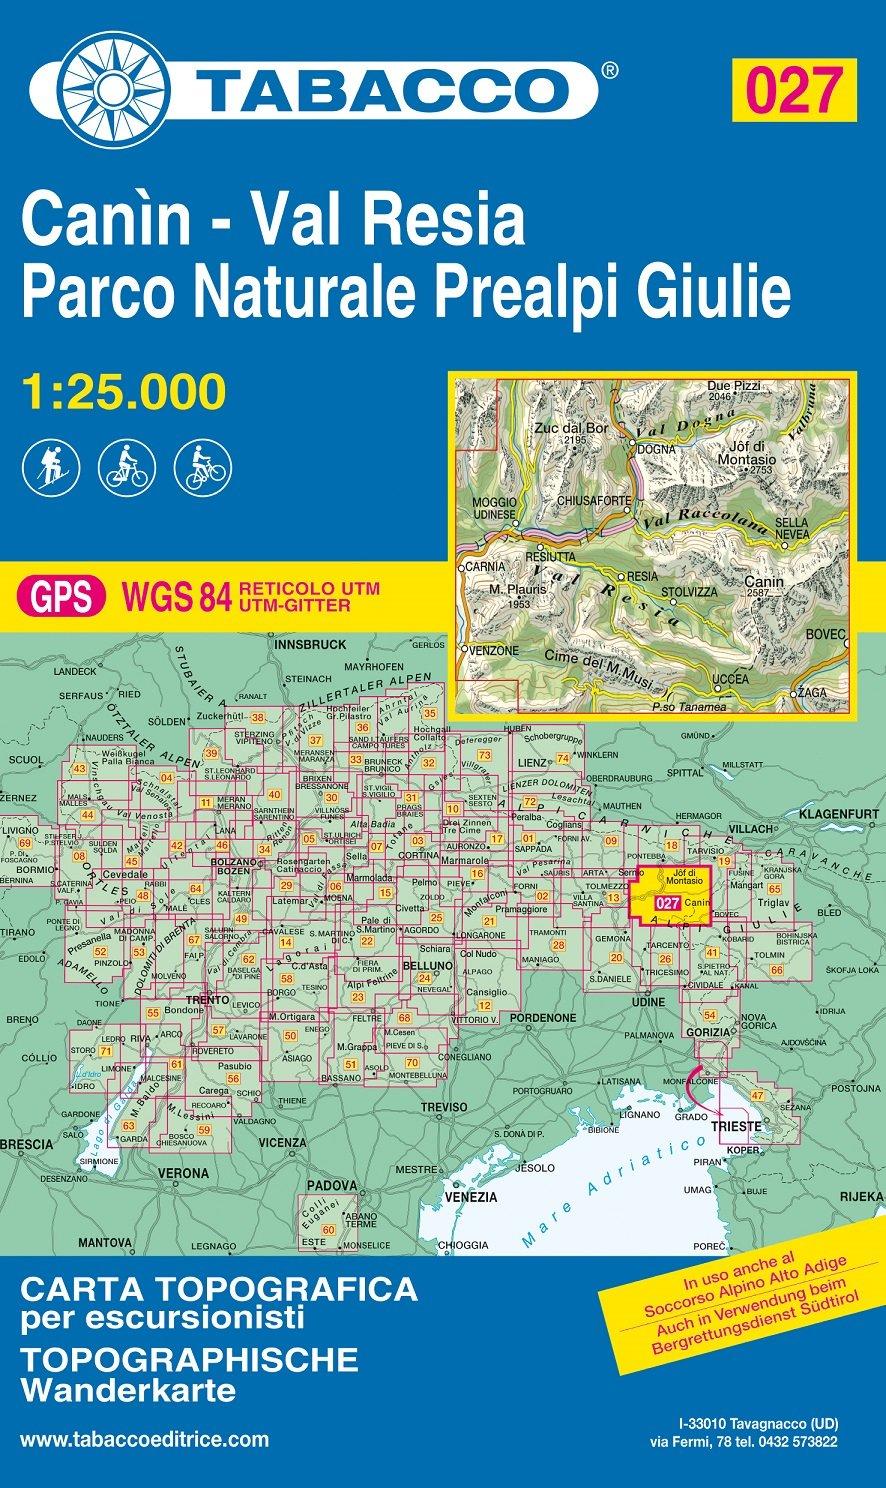 TAB-27  Canin - Valli di Resia e Raccolana | Tabacco wandelkaart 9788883151293  Tabacco Tabacco 1:25.000  Wandelkaarten Zuidtirol, Dolomieten, Friuli, Venetië, Emilia-Romagna